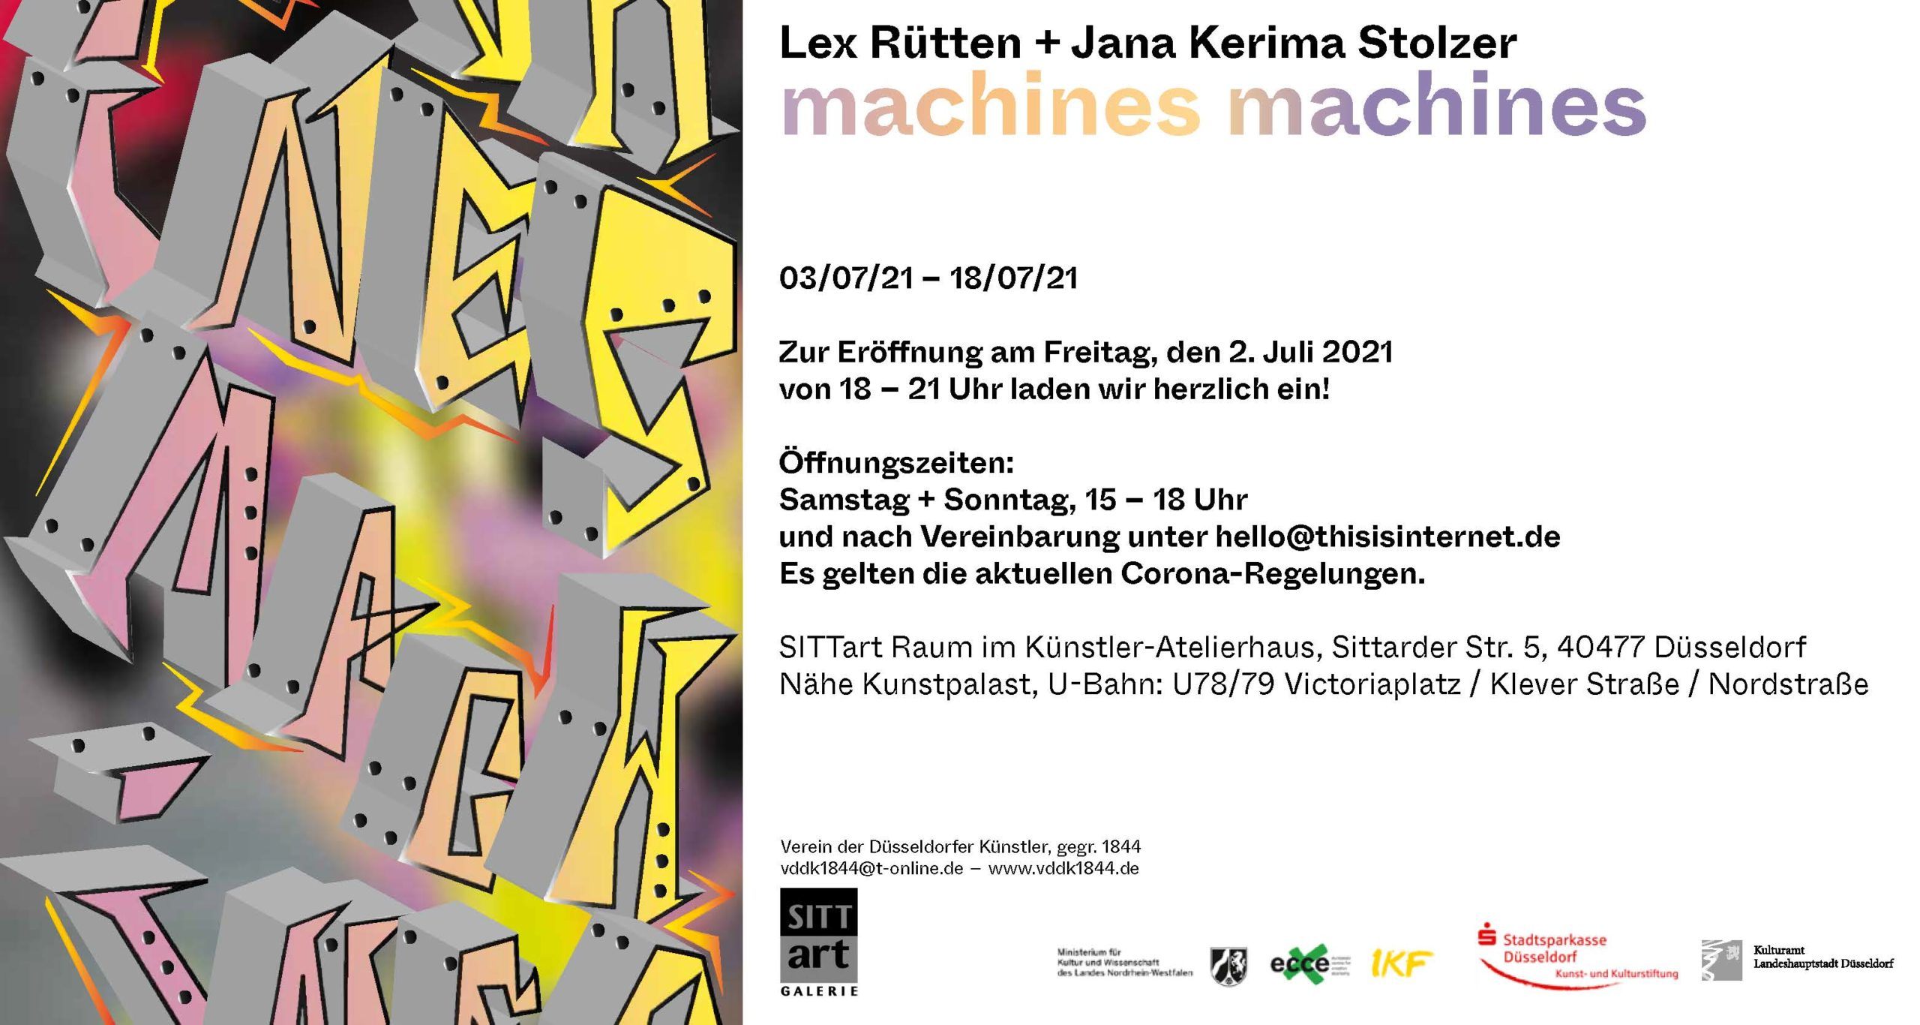 machines machines – Lex Rütten u Jana Kerima Stolzer